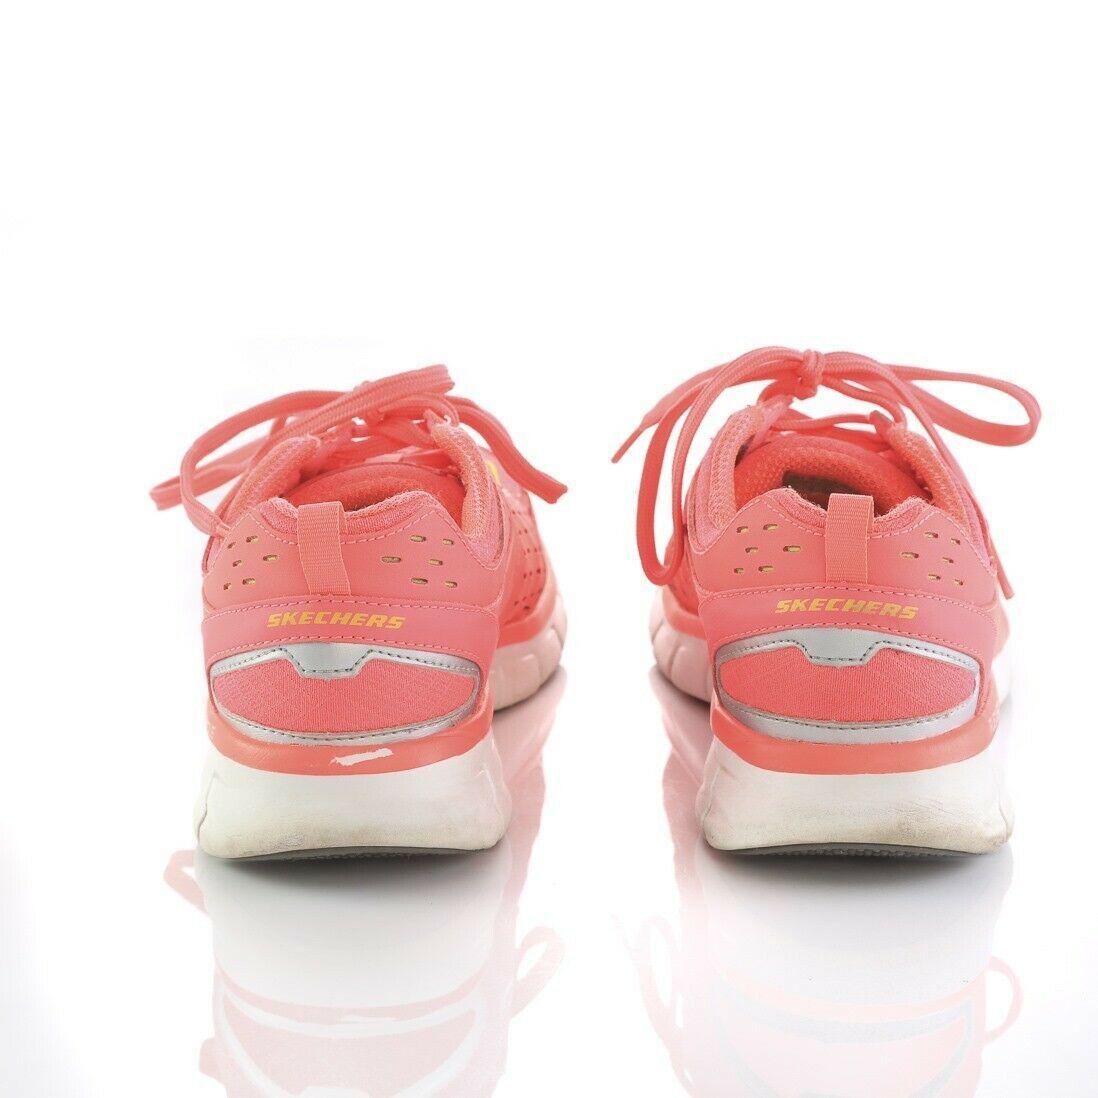 Skechers Sport Neon Pink Athletic Tennis Shoes Sneakers Memory Foam Womens 8